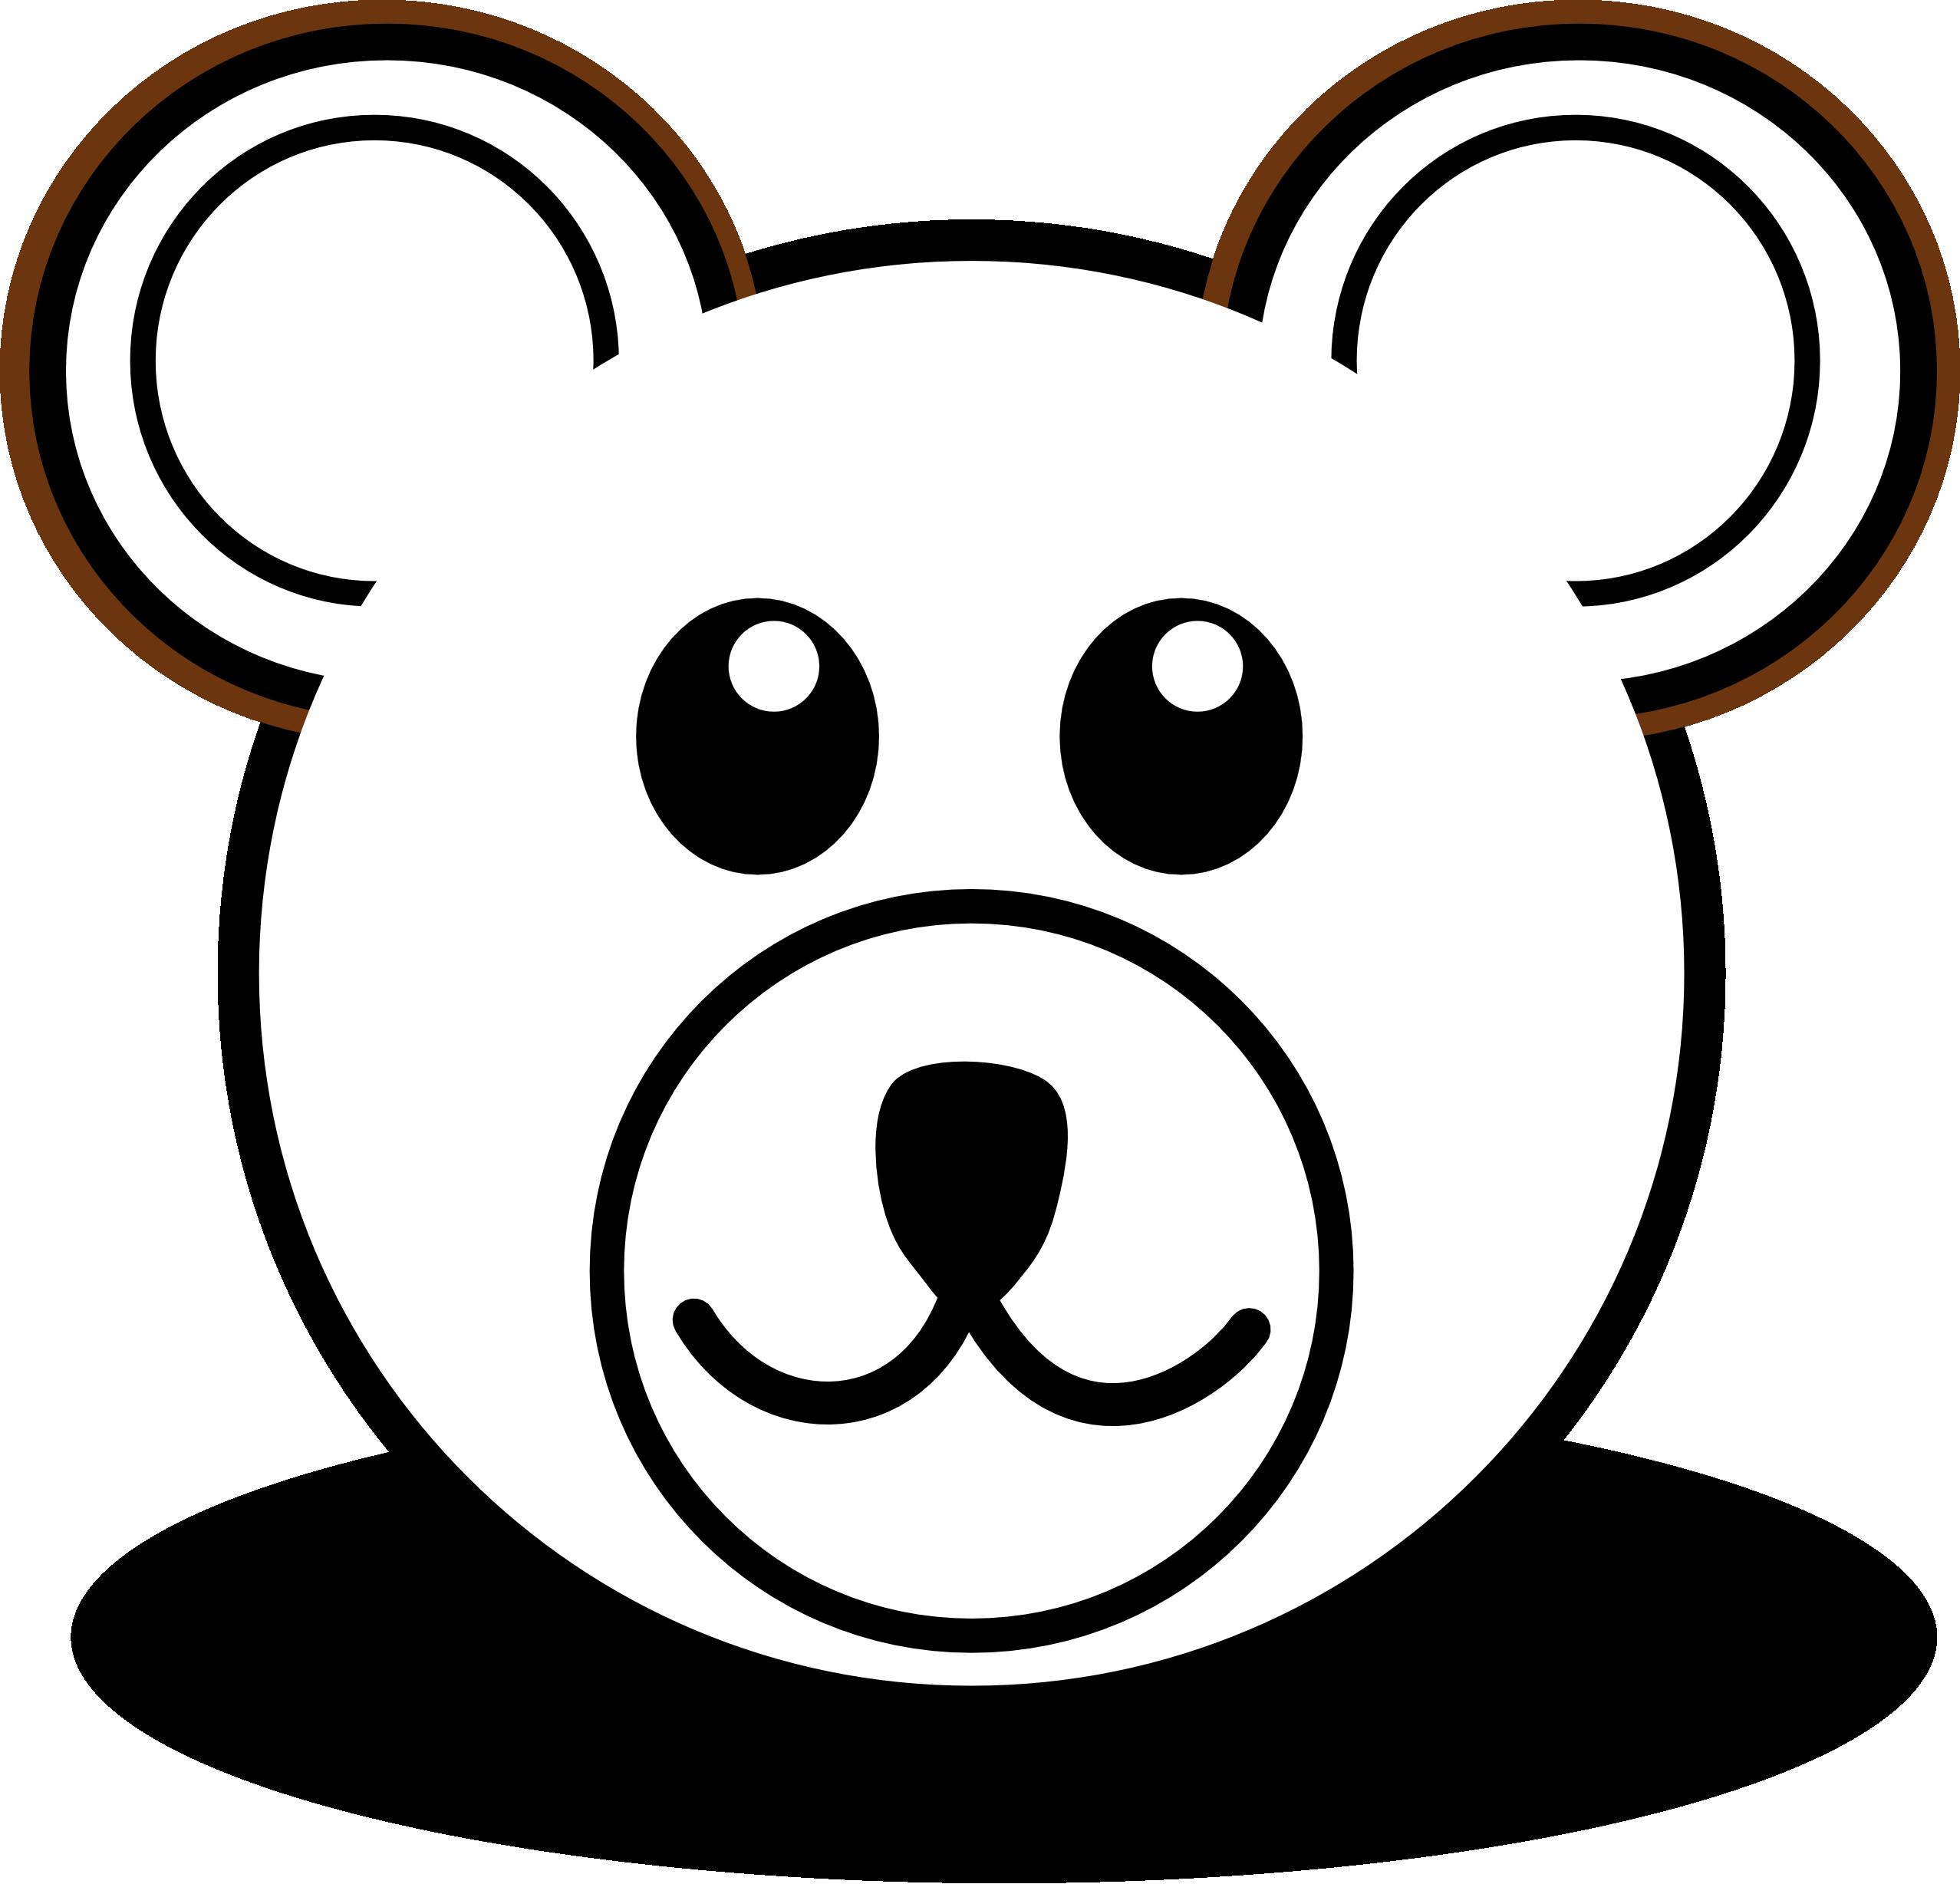 Outline Of A Teddy Bear - Cliparts.co